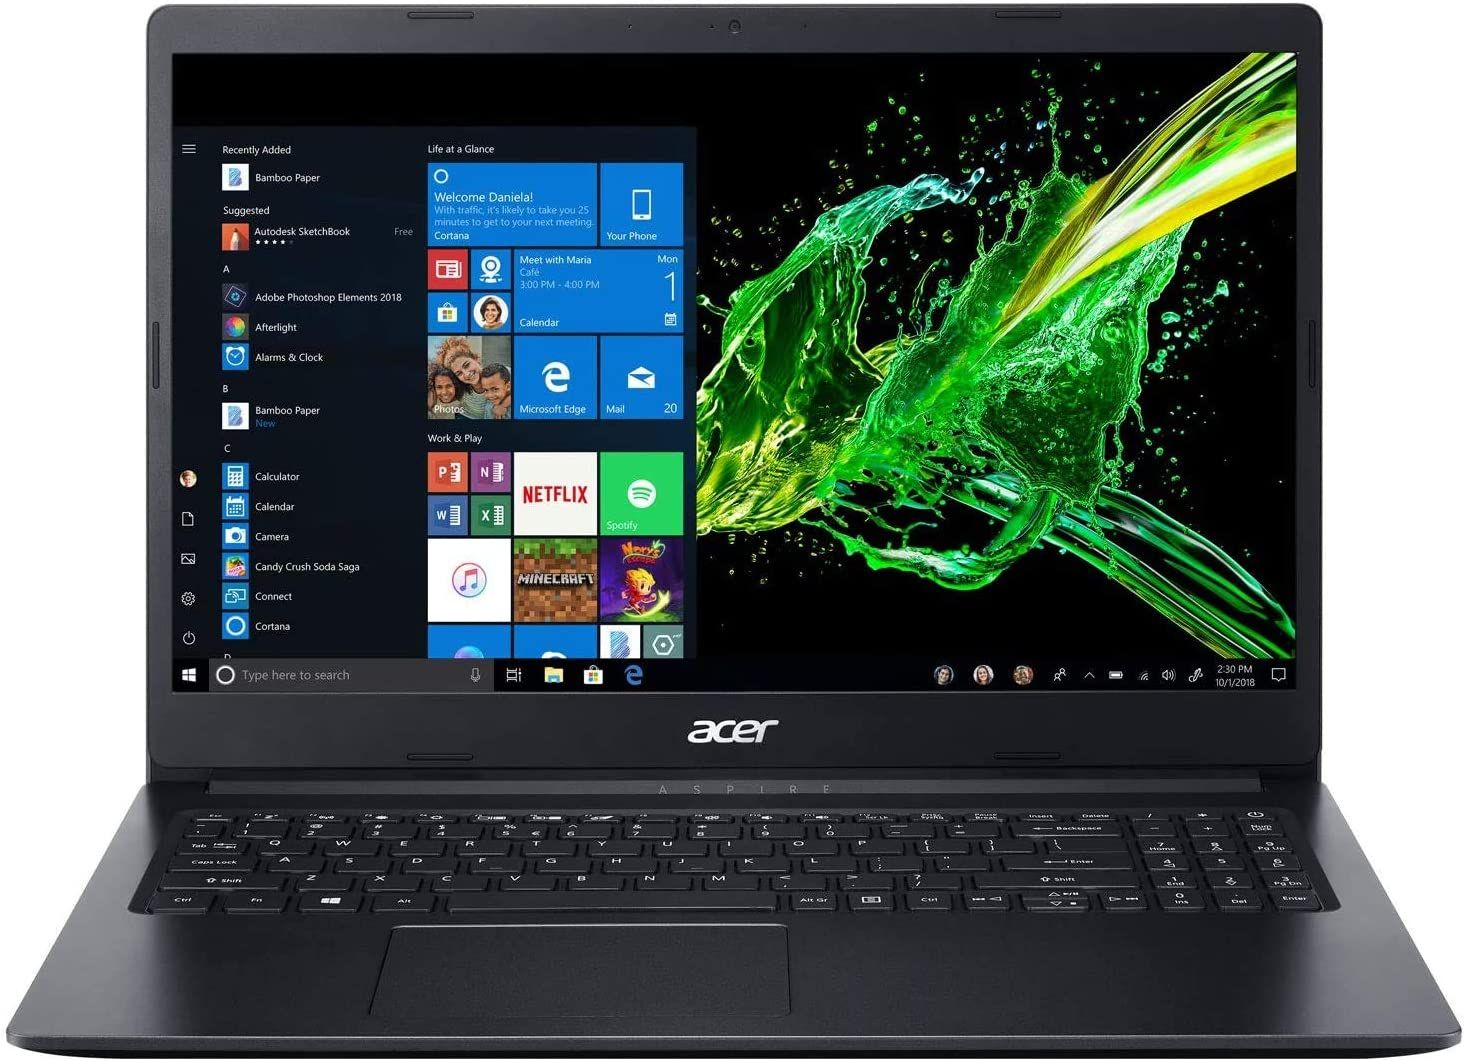 "Acer Aspire 1 15.6"" Full HD Laptop Intel Celeron N4120, 4GB RAM - 64GB eMMC Windows 10"